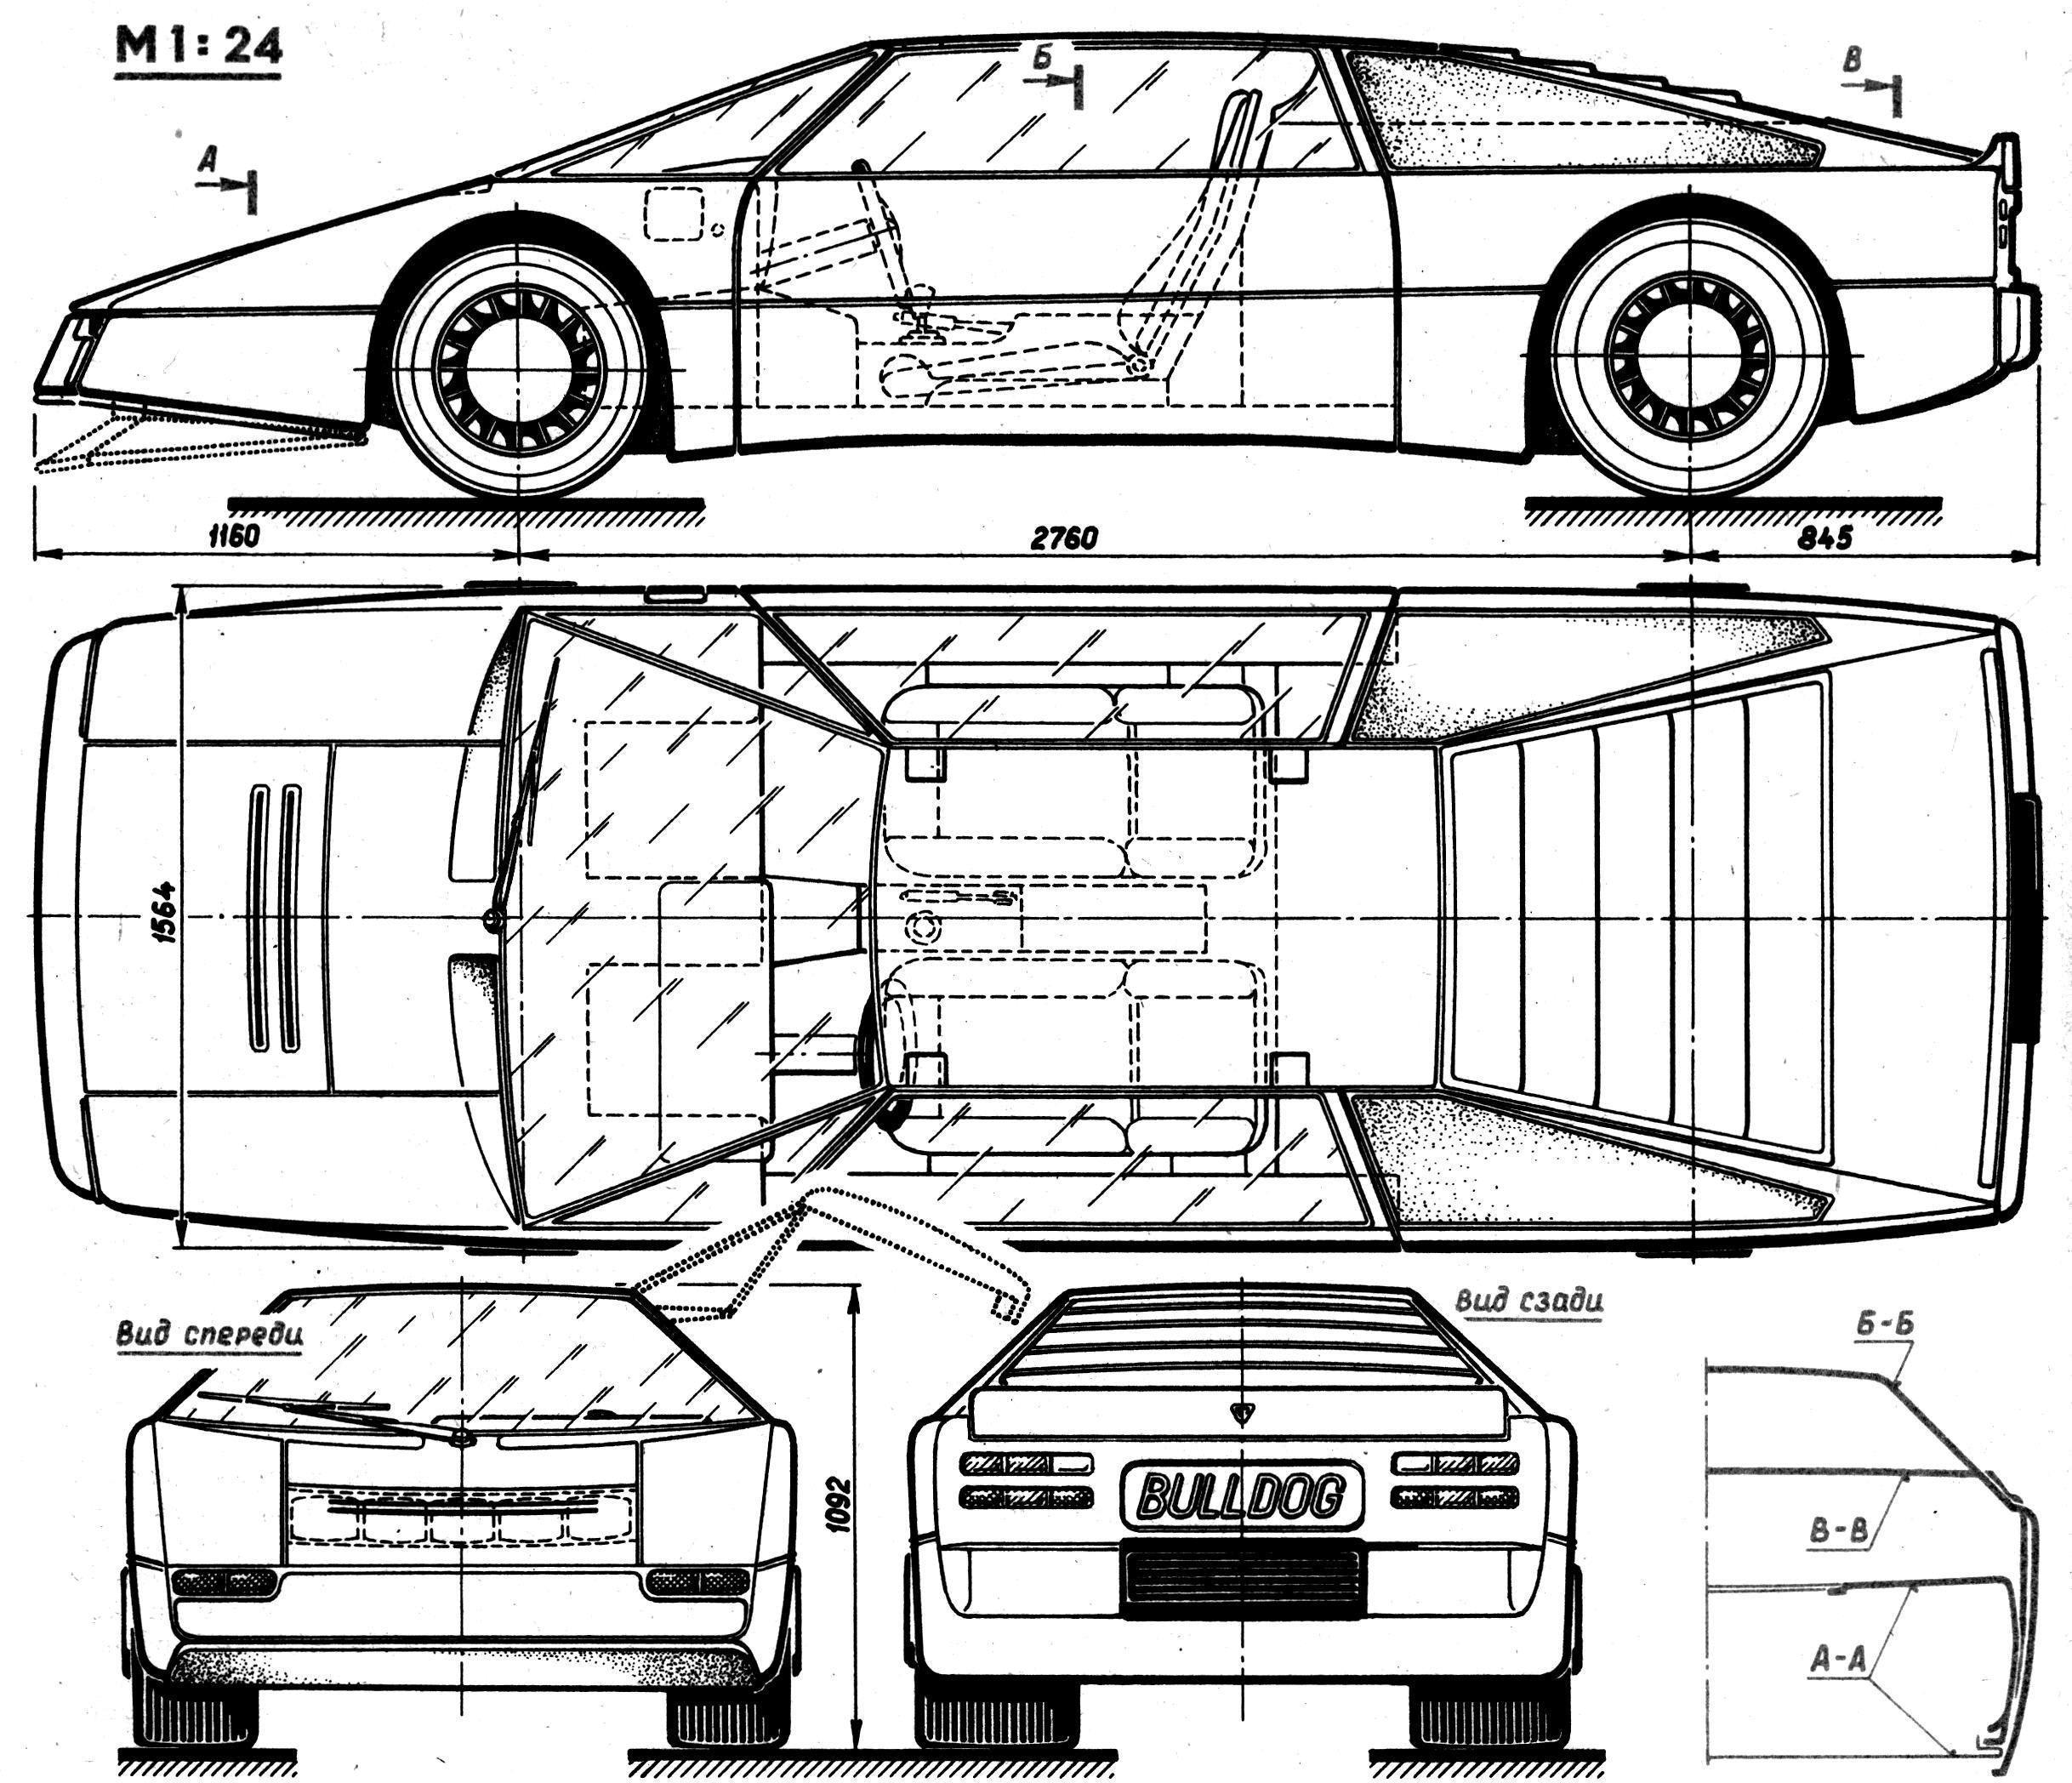 Power Wheel Wiring Diagram For Mercedes